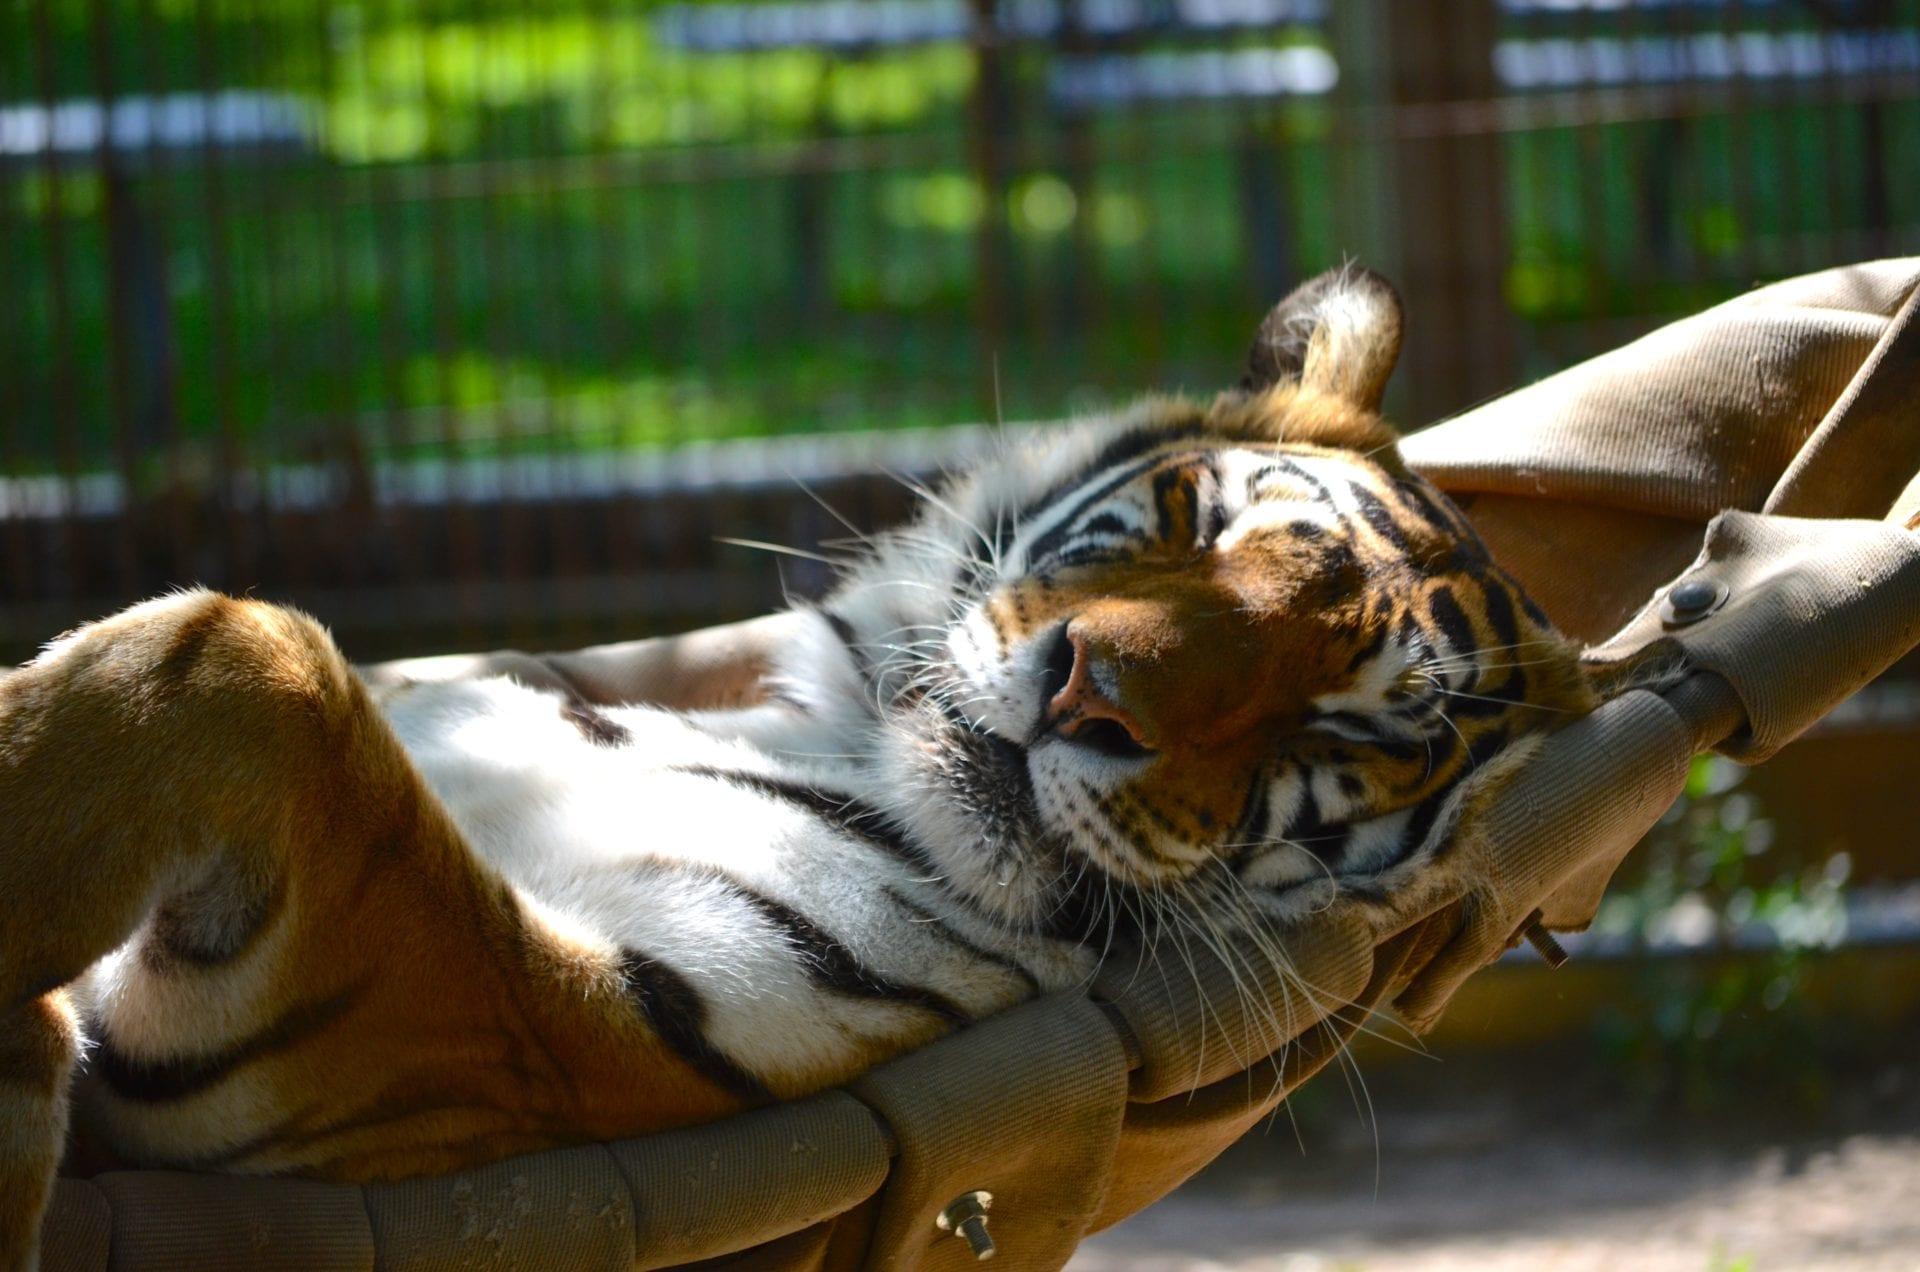 Crown Ridge Tiger Sanctuary